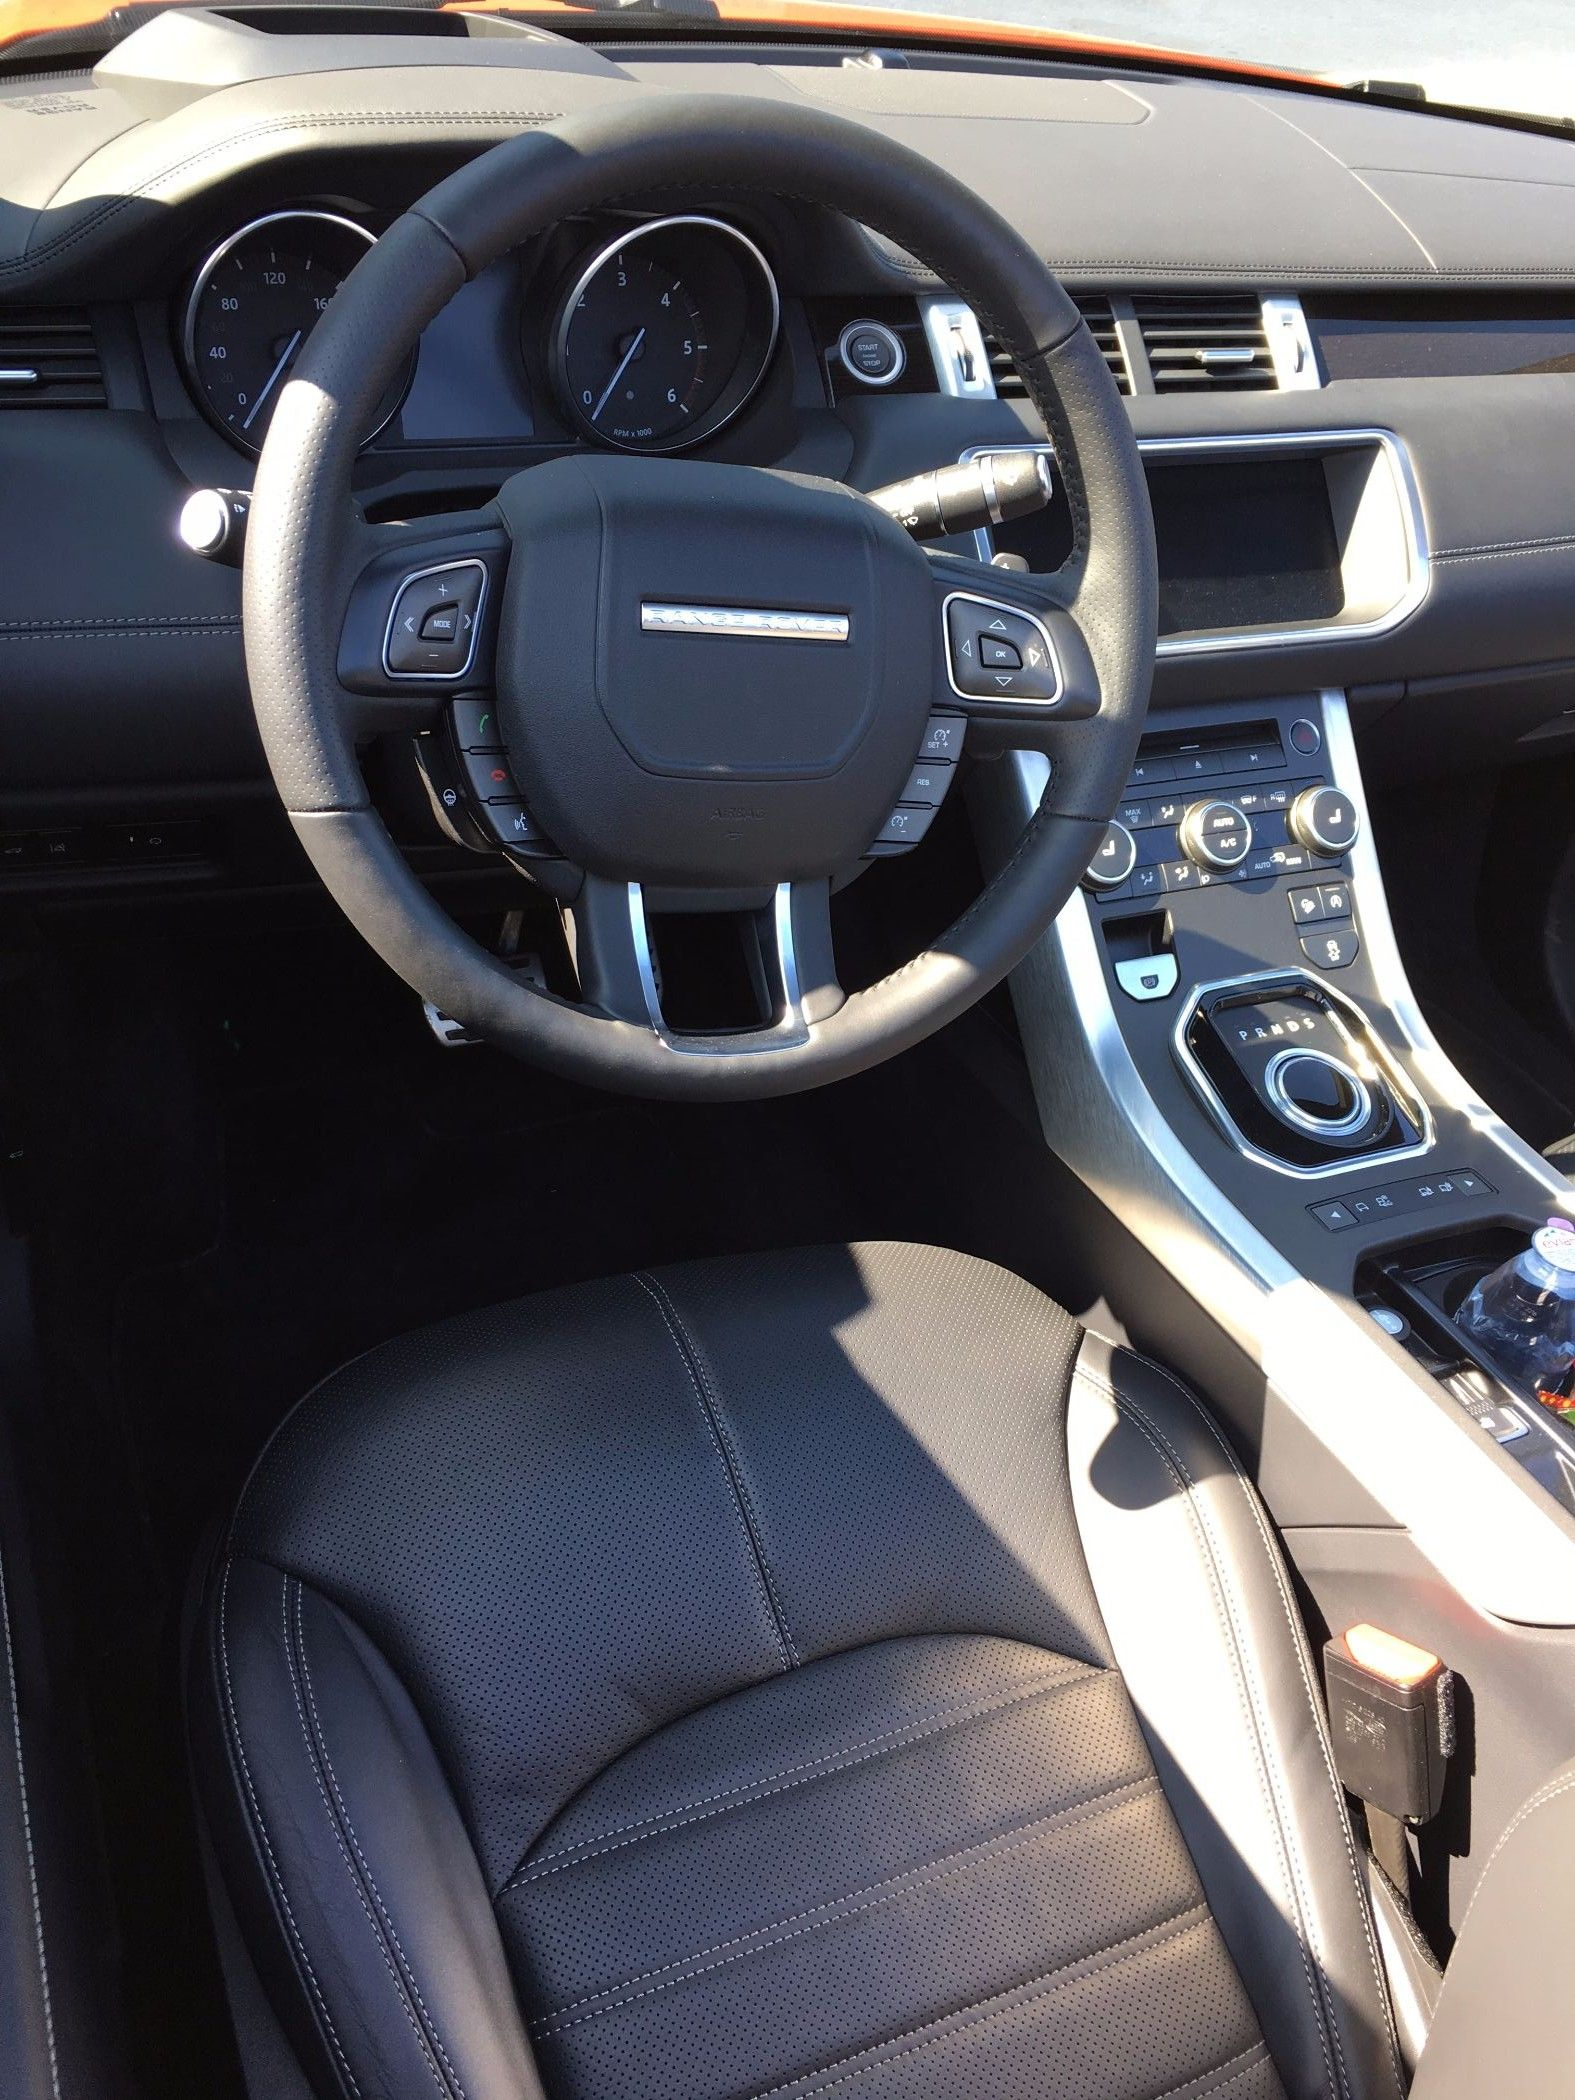 Range Rover Evoque Cabrio Innenraum